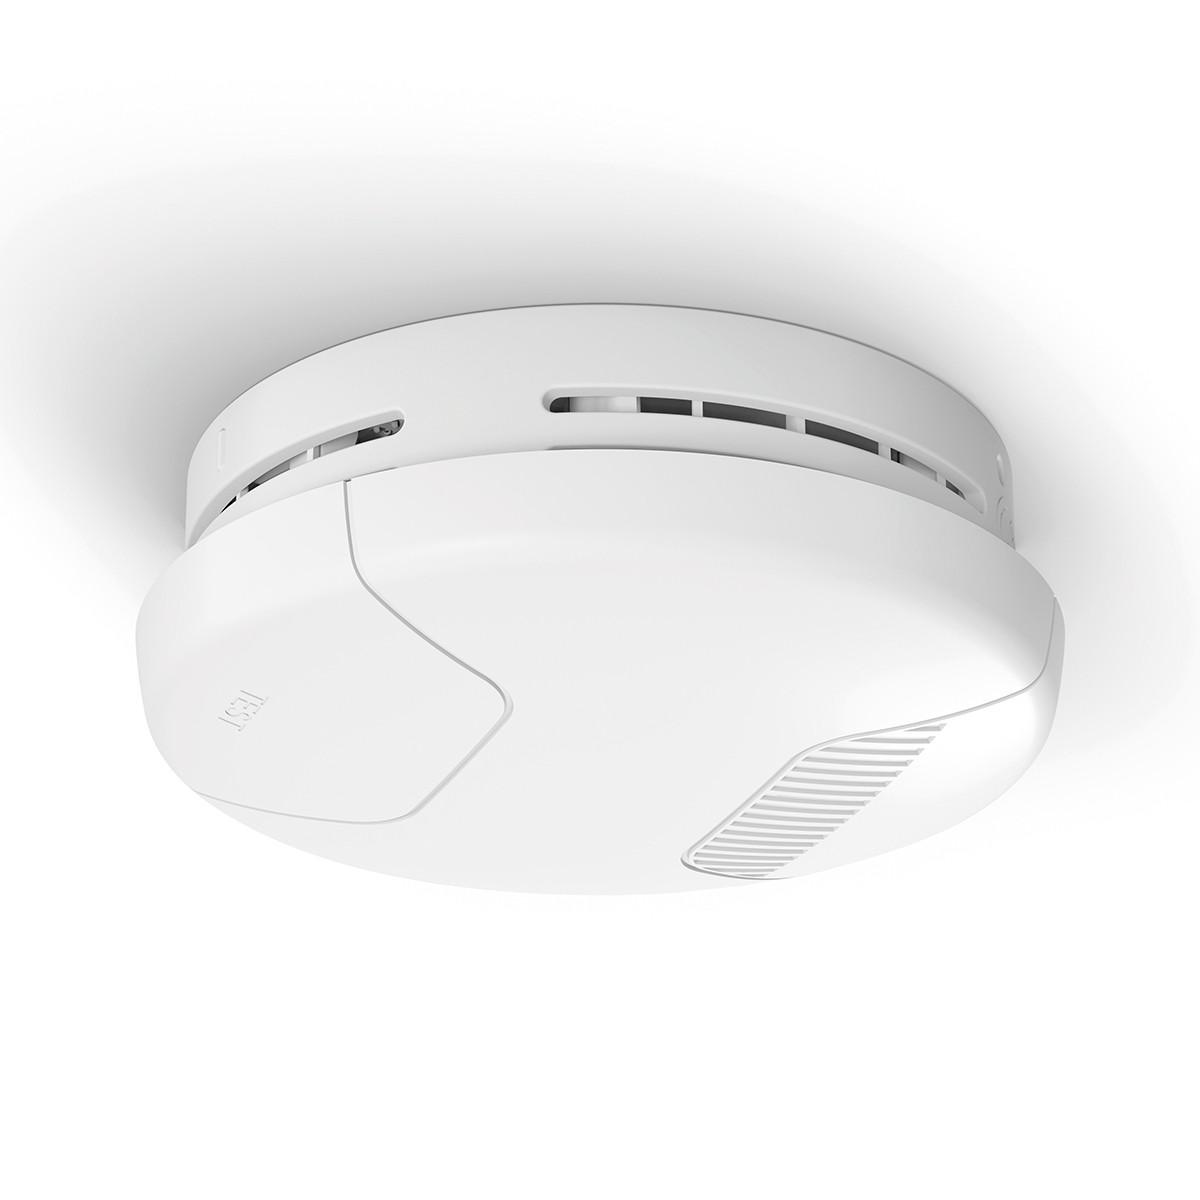 Detector de humo inteligente para el hogar - Gigaset Smoke Sensor 2.0